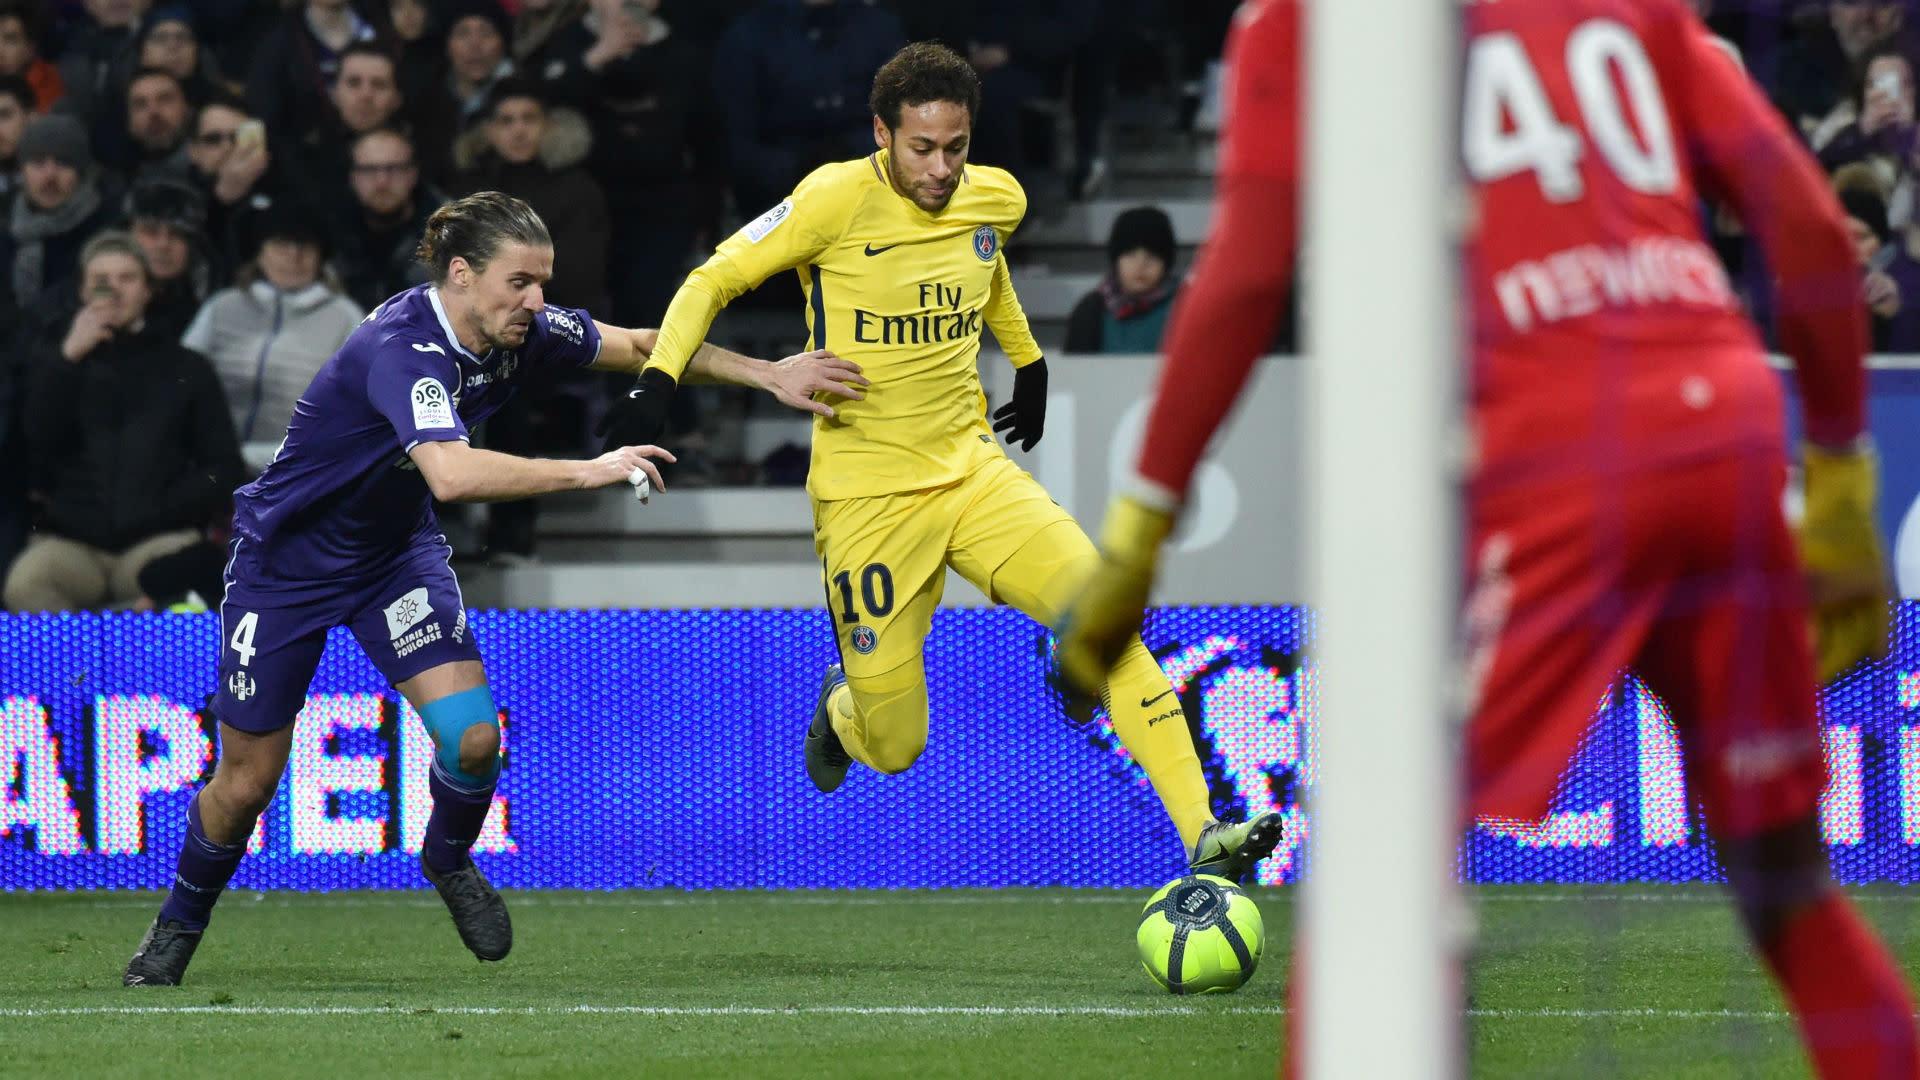 golden goal em 2019